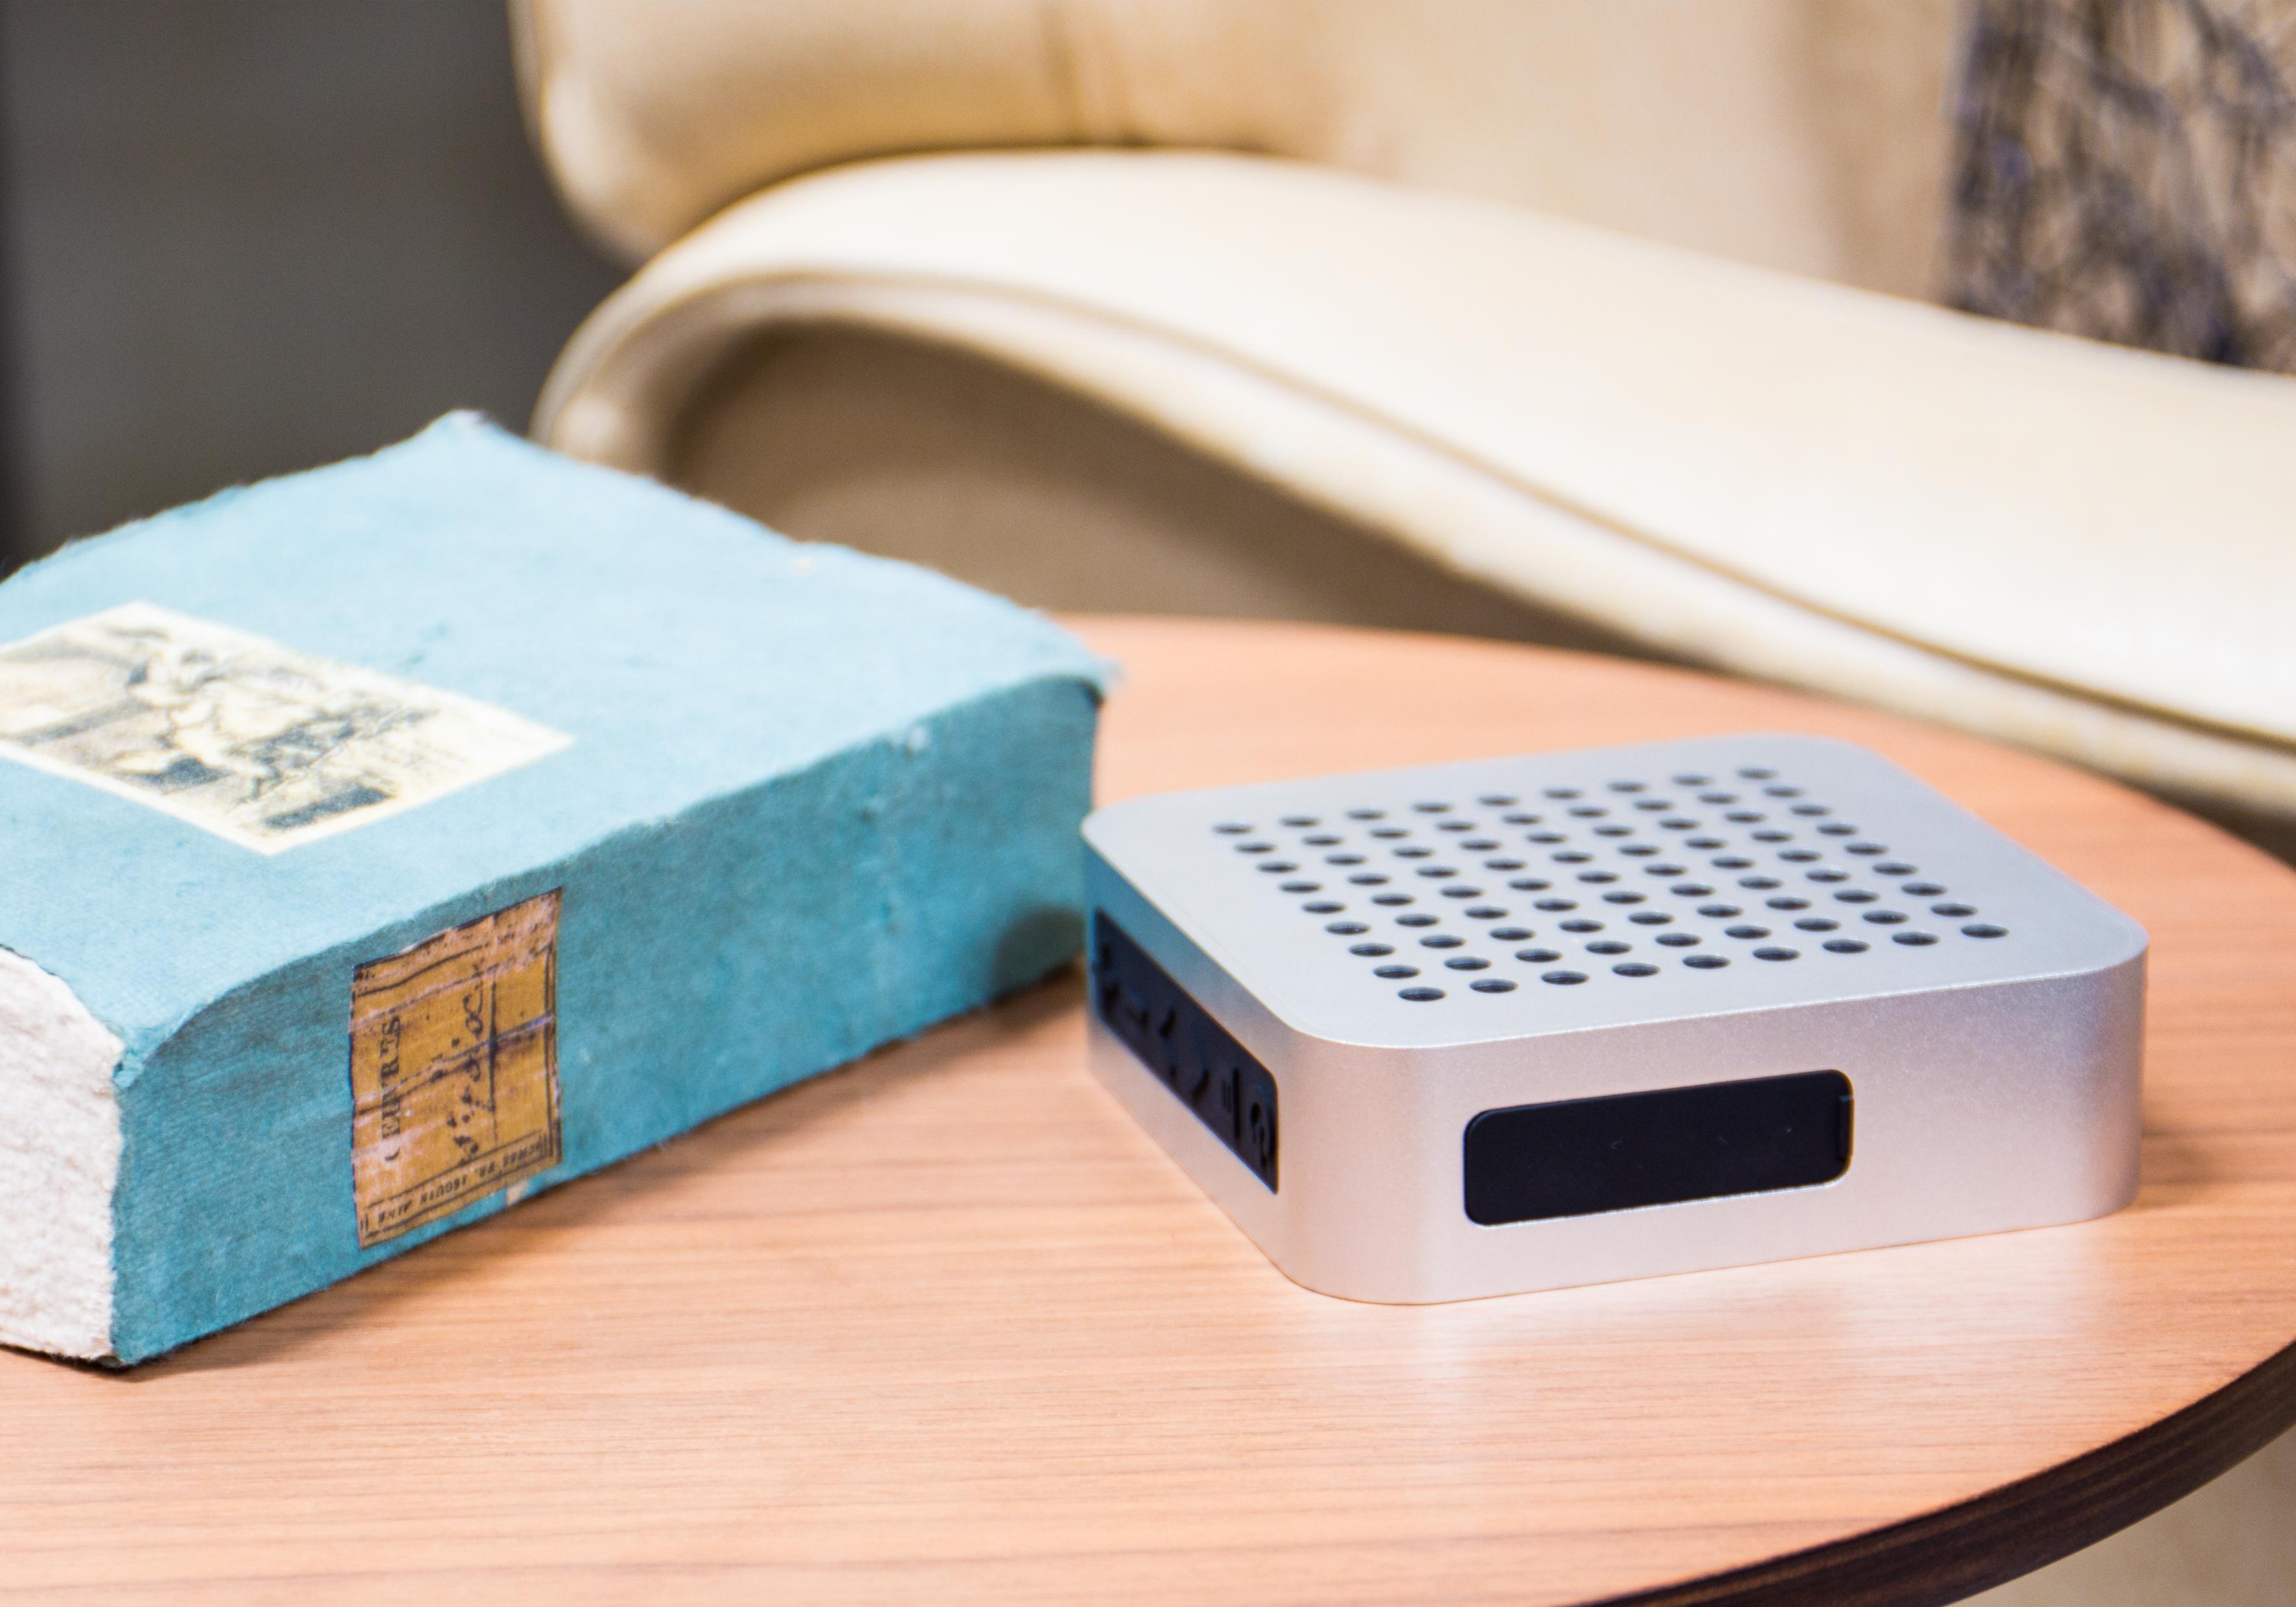 blaupunkt bt 50 sv bluetooth lautsprecher mit mikrofon f r freisprecheinrichtung box. Black Bedroom Furniture Sets. Home Design Ideas